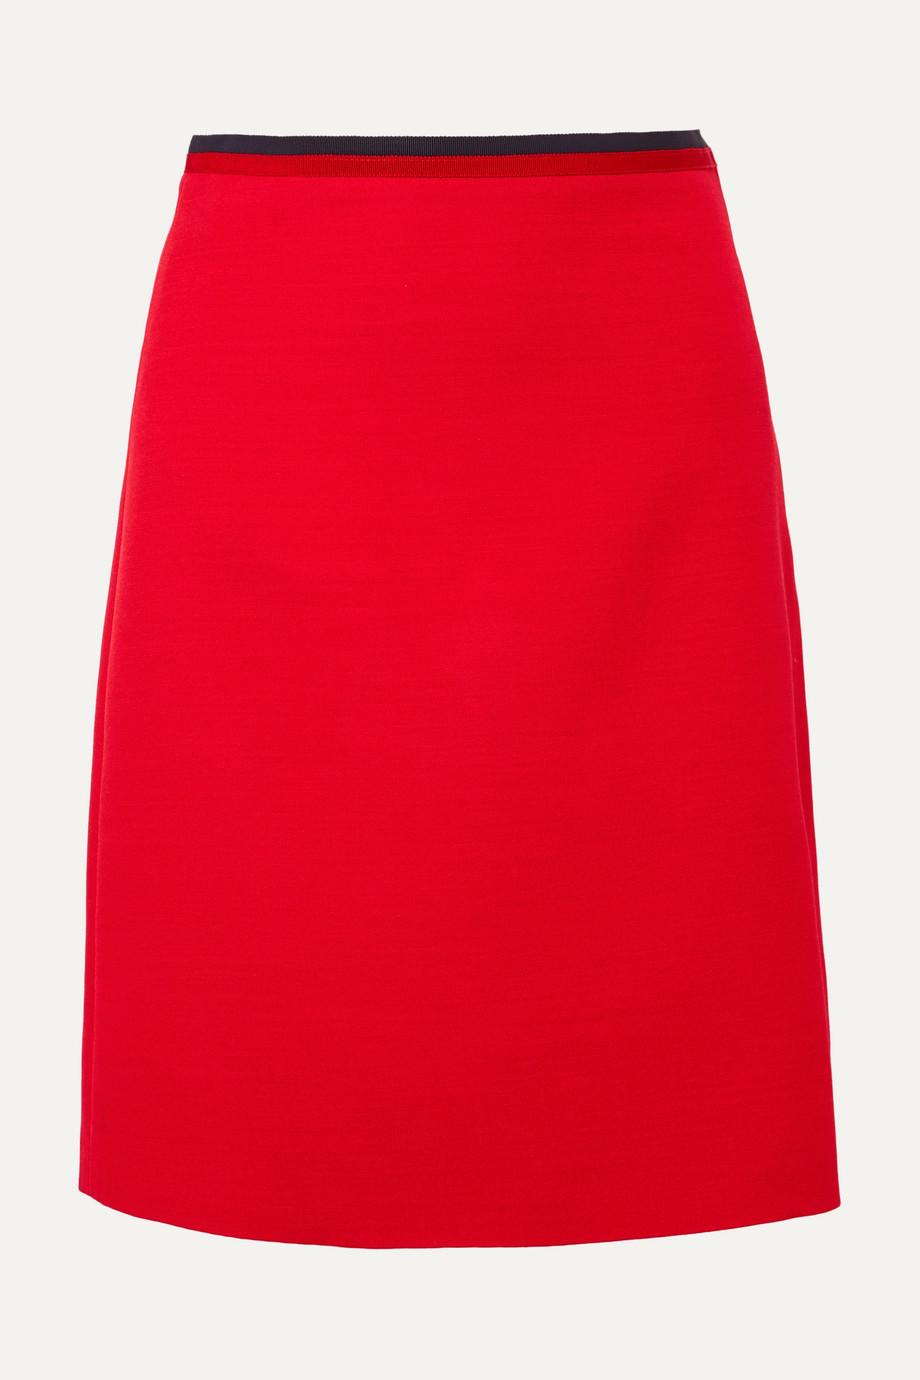 Gucci Silk and wool-blend mini skirt